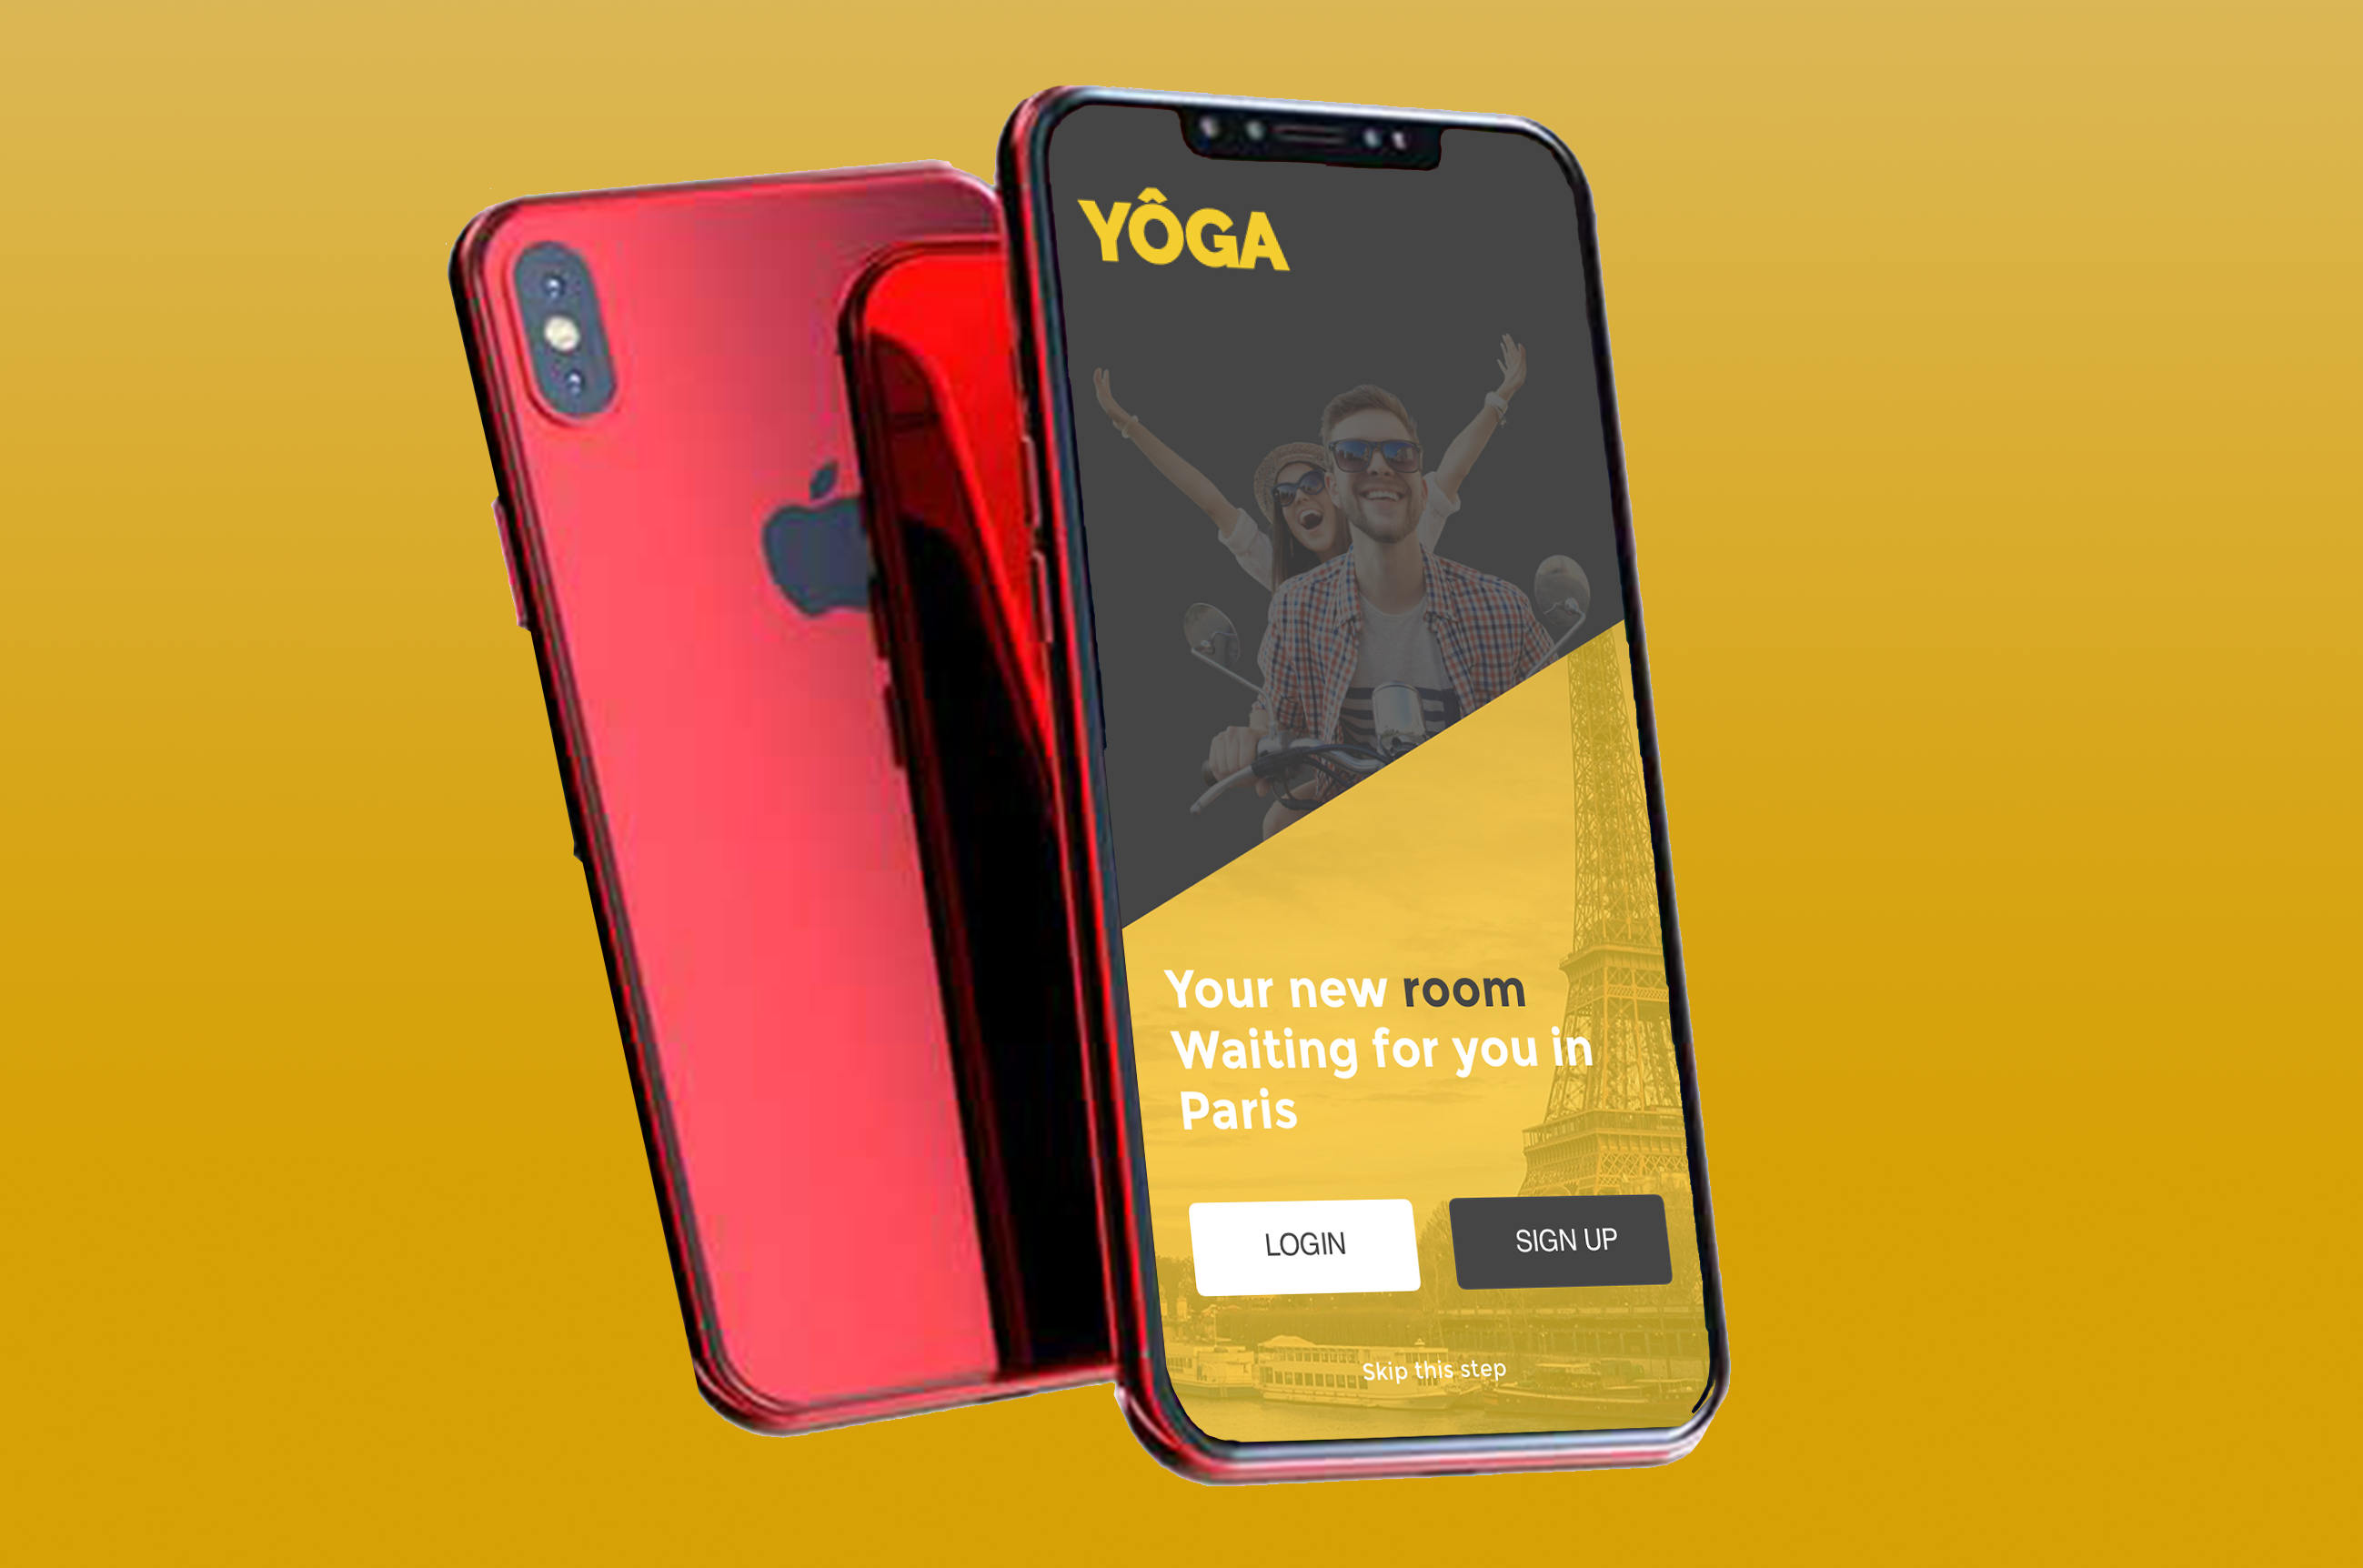 développement sur mesure ios android yoga likeweb agency studio design marketing branding ux/ui design marché chinois shangai